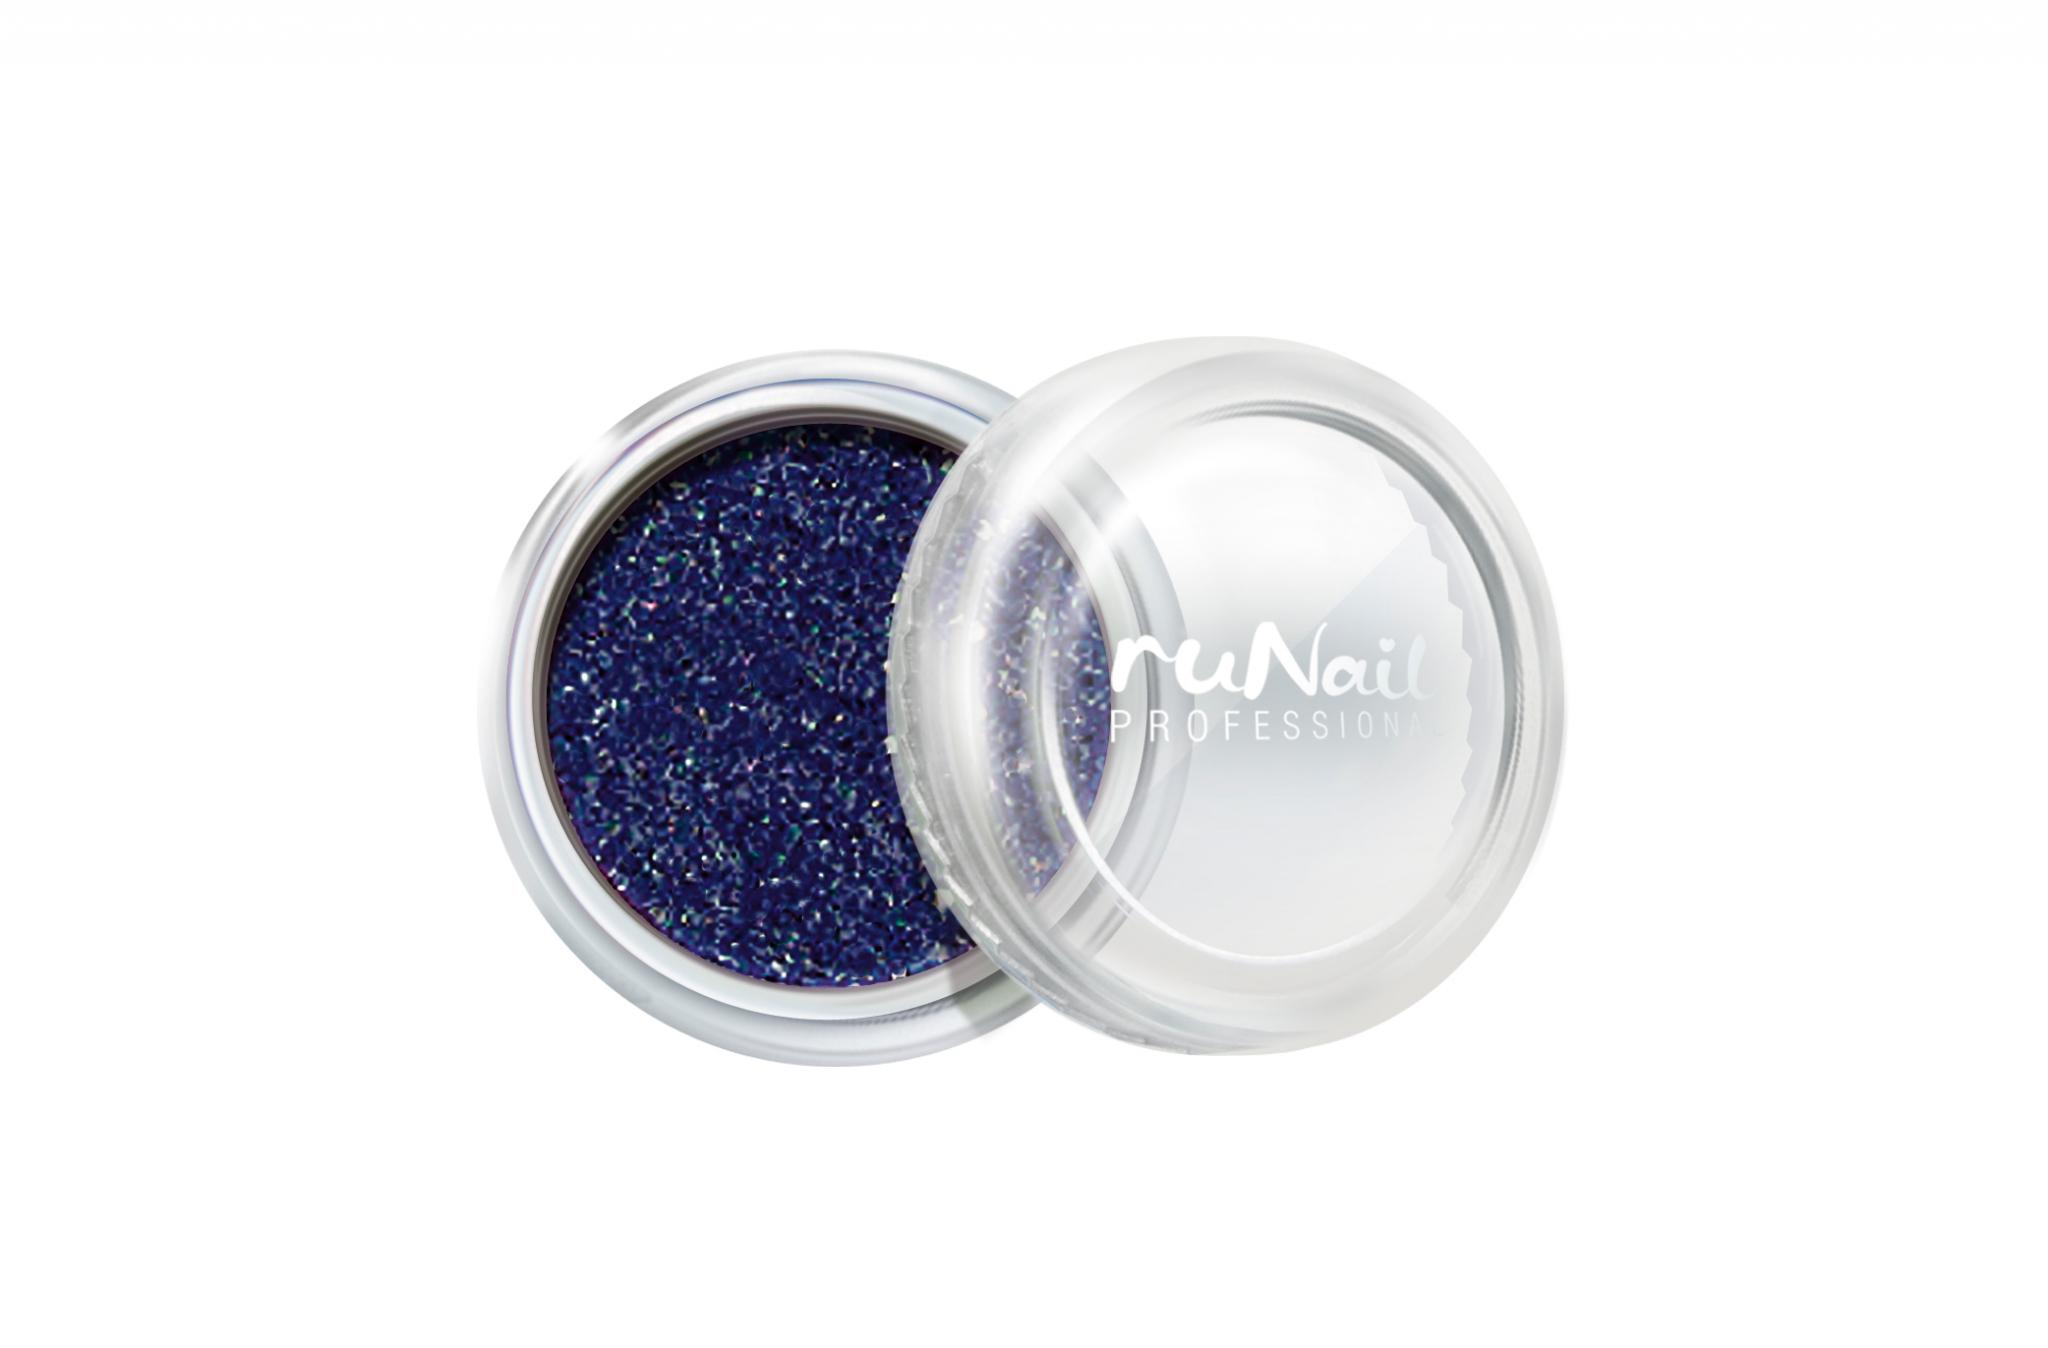 Дизайн для ногтей: зеркальная пыль №4288